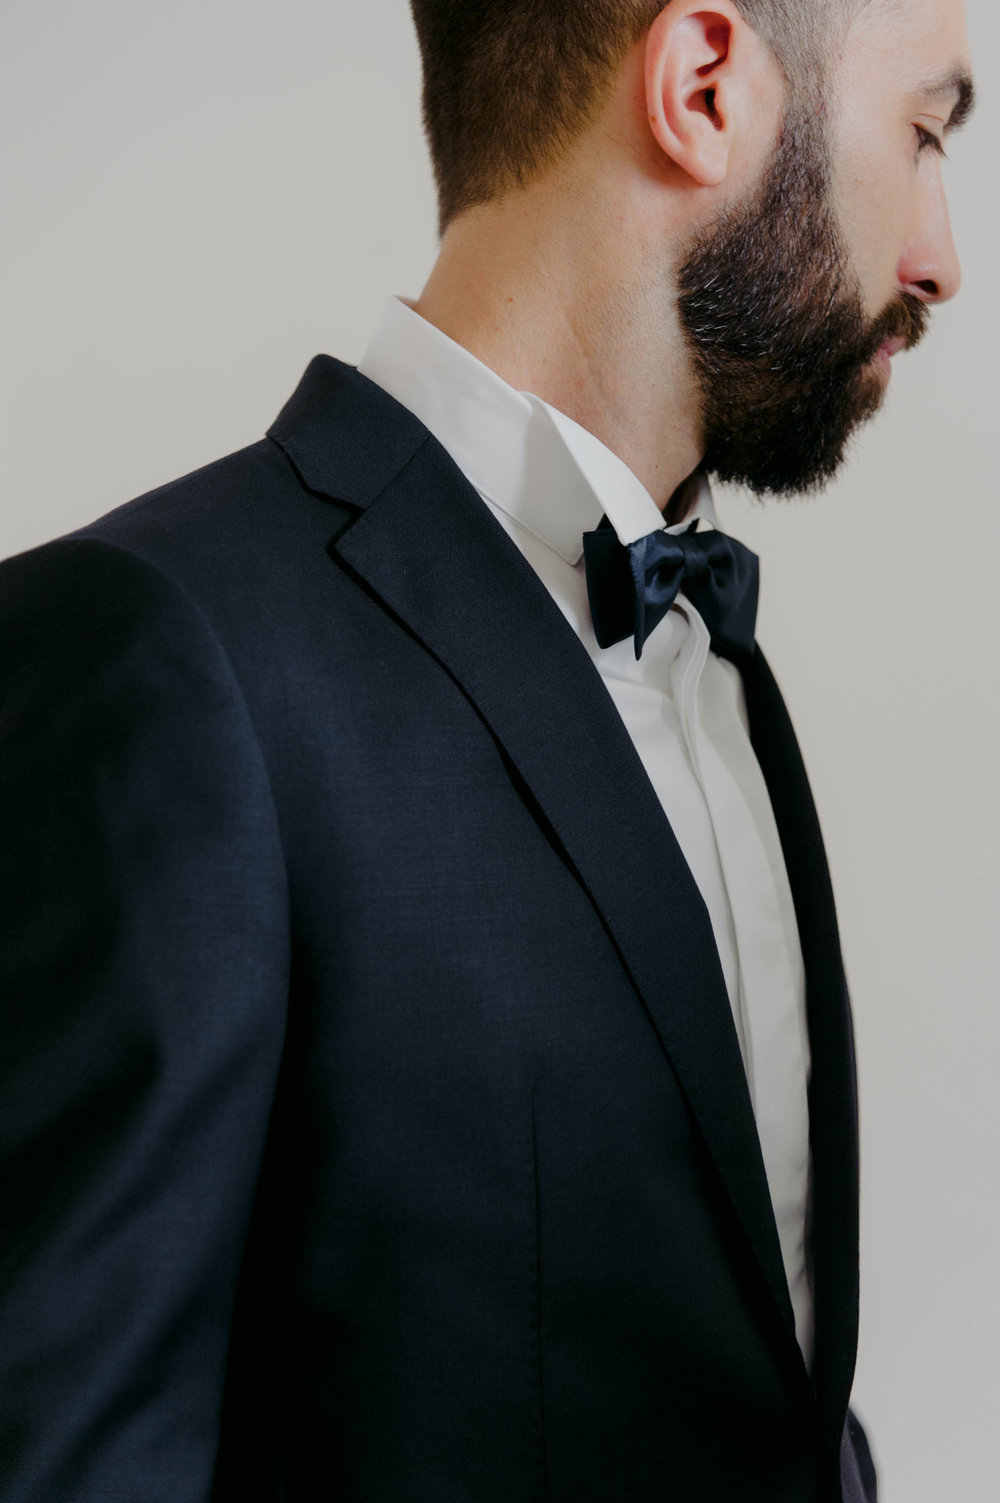 079 - Preparazione sposi.jpg